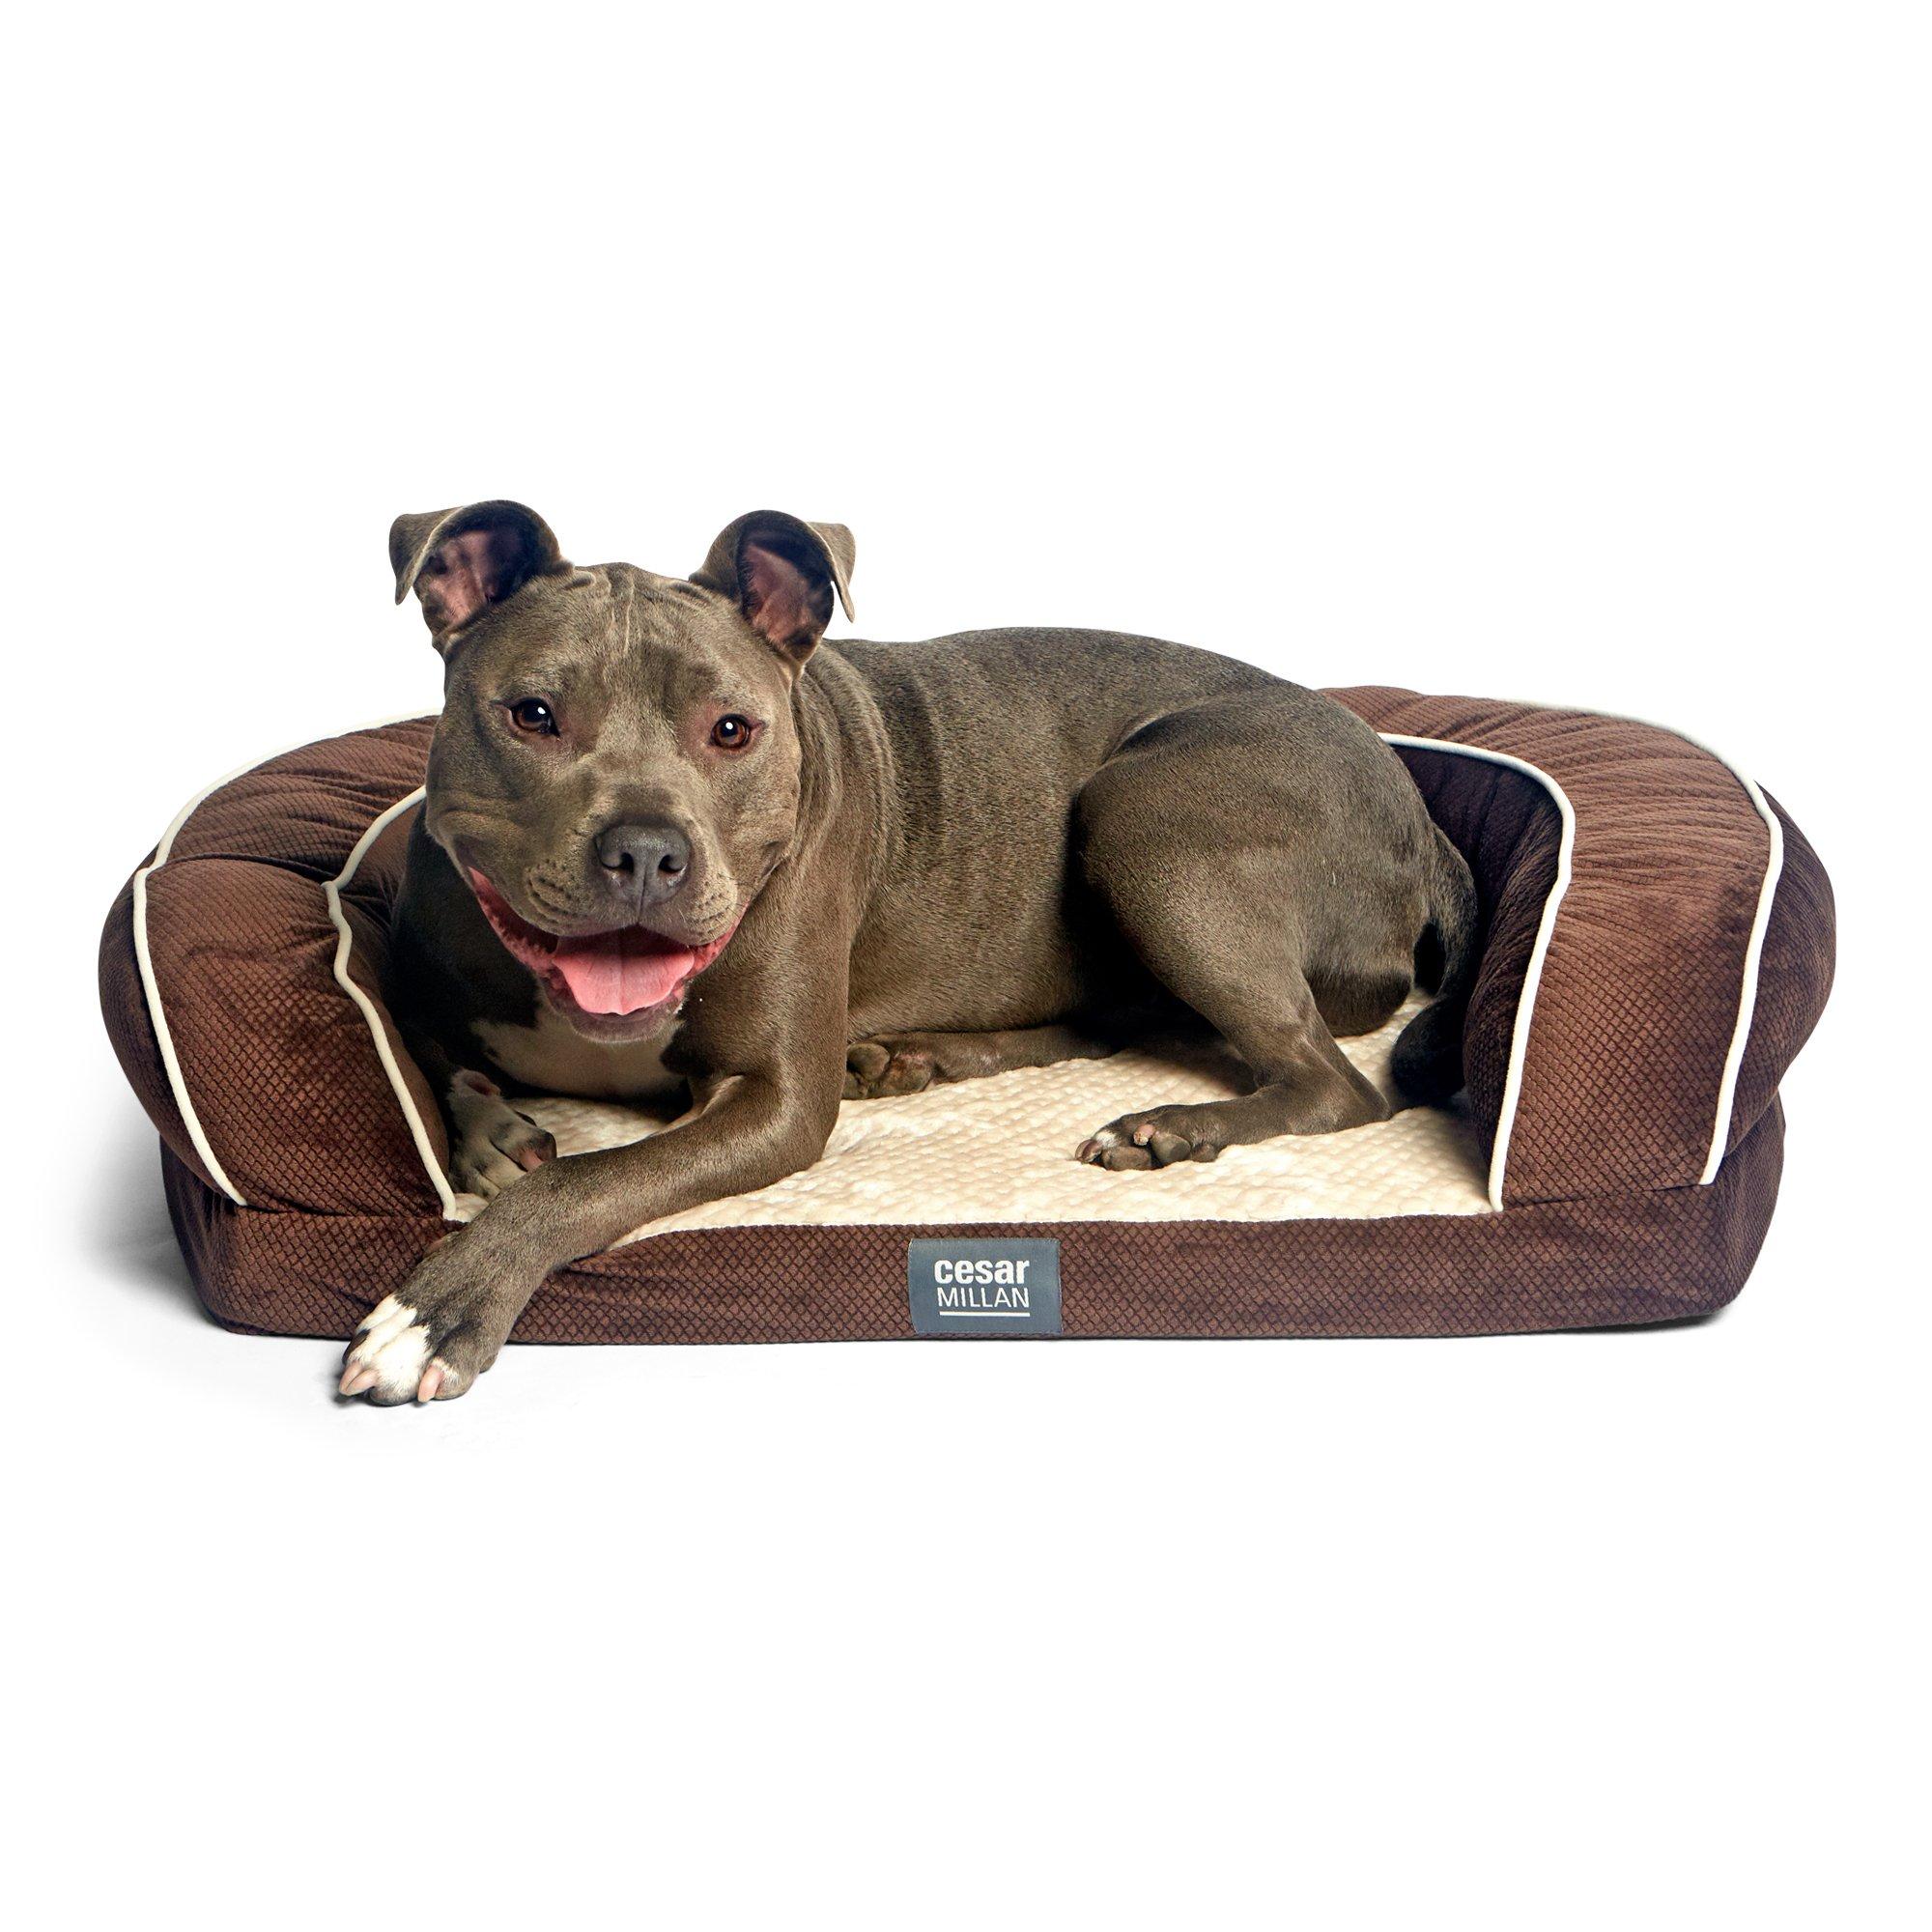 Cesar Millan Ortho Bliss Dog Bed by Cesar Millan